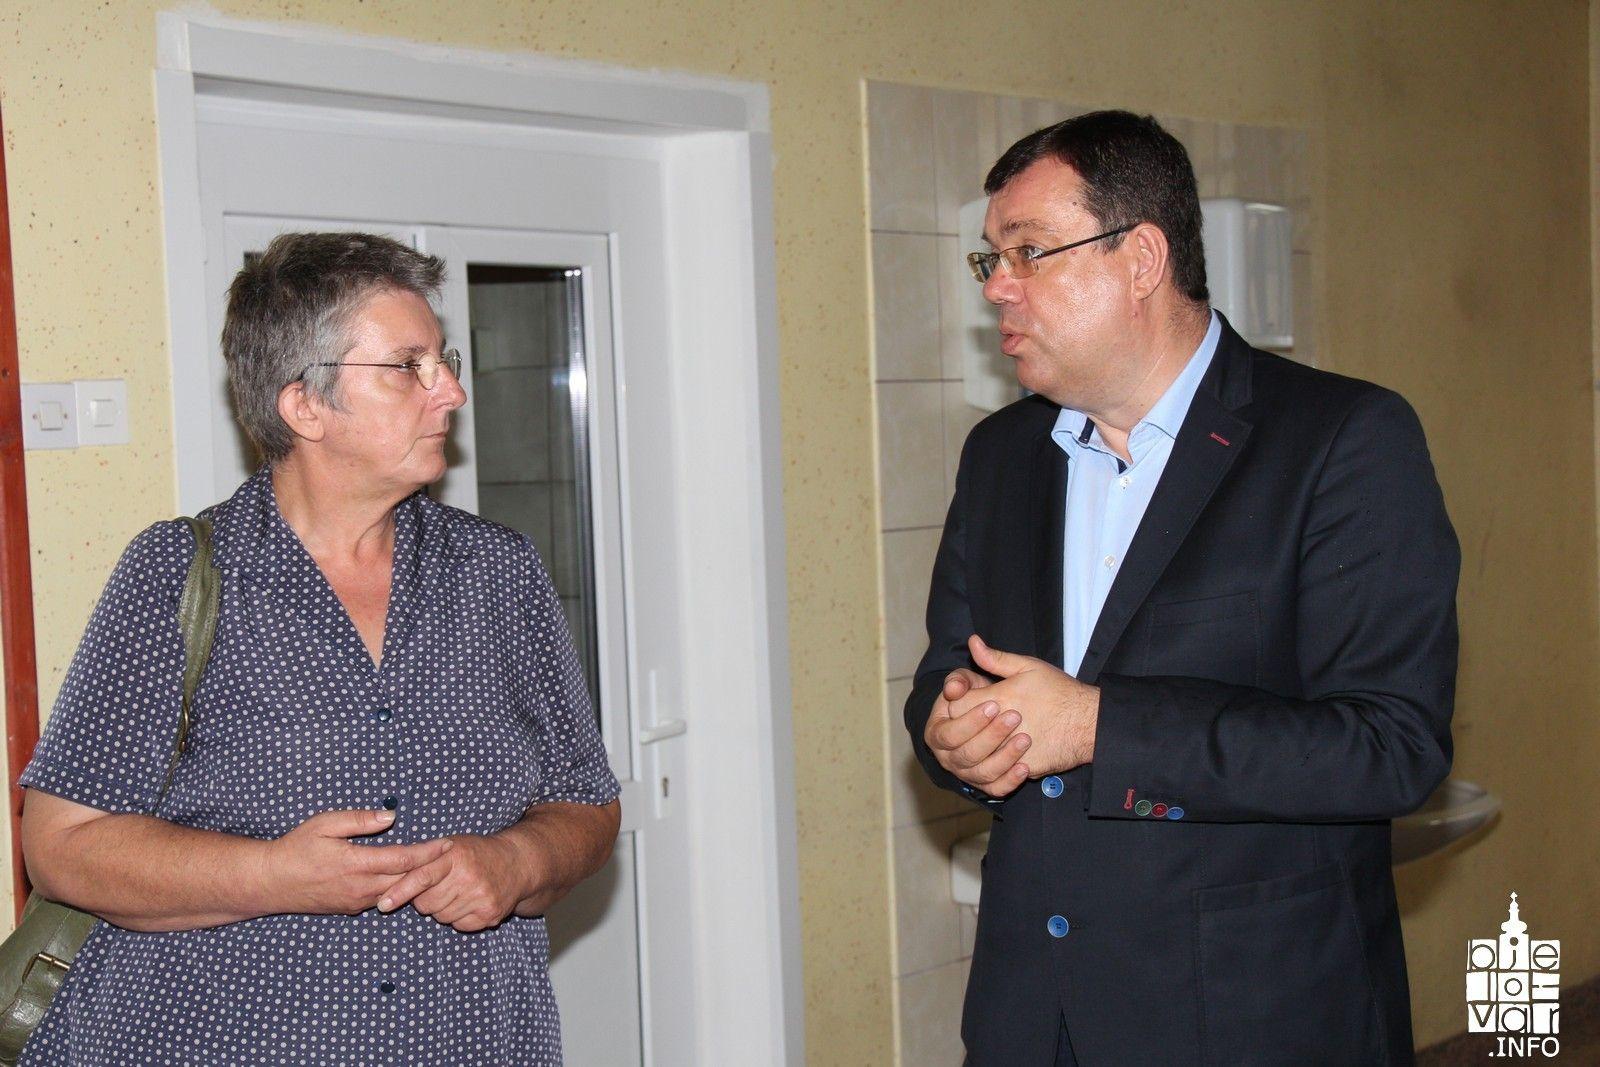 Najavljena kategorizacija bjelovarskog Đačkog doma u hostel